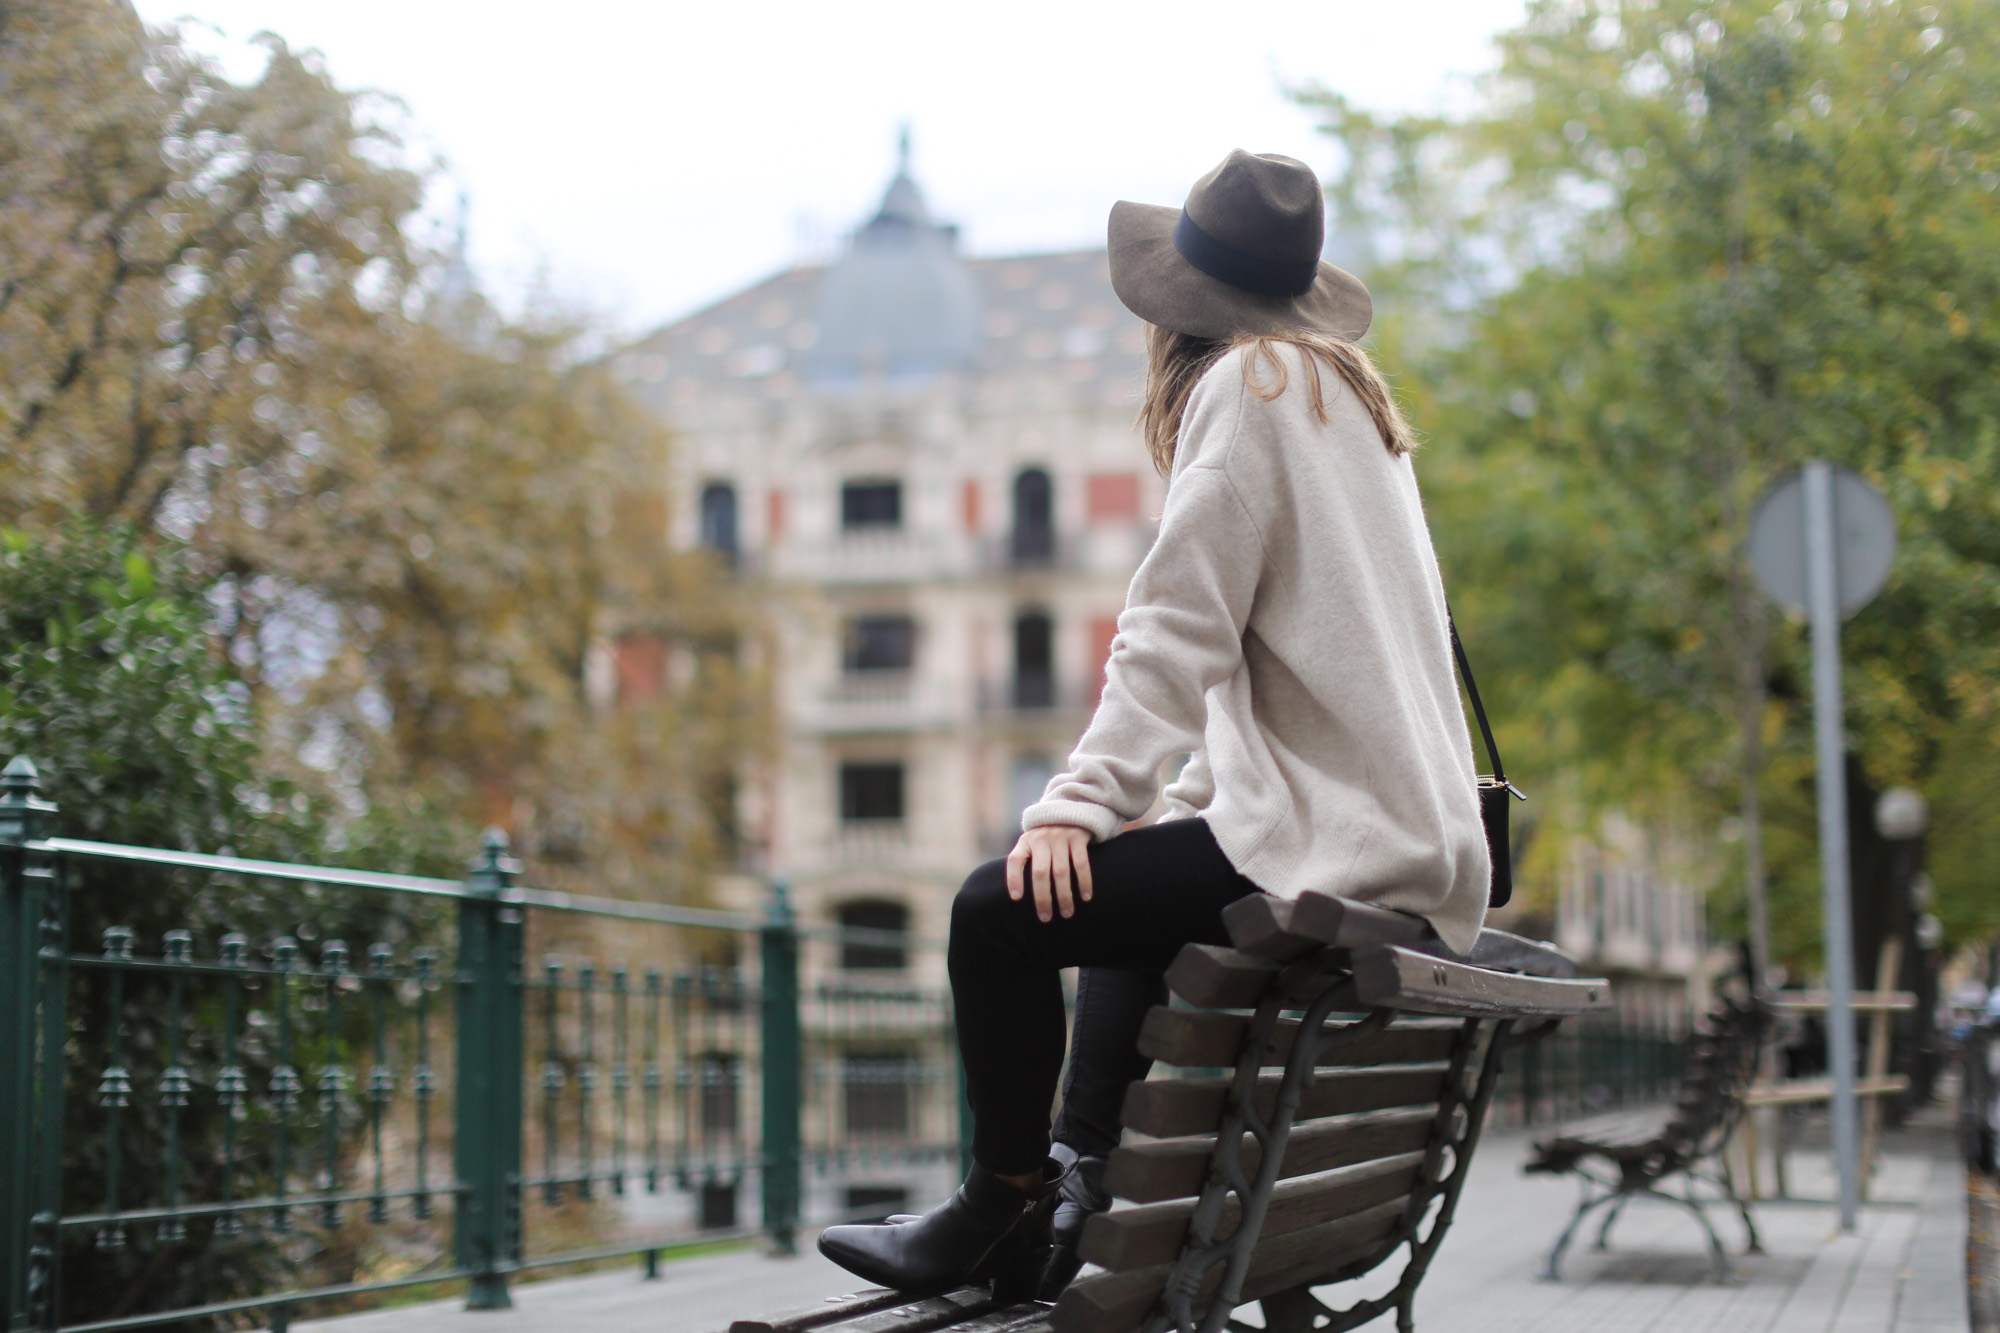 Clochet-streetstyle-celine-trio-bag-zara-oversized-knit-fedora-hat-5